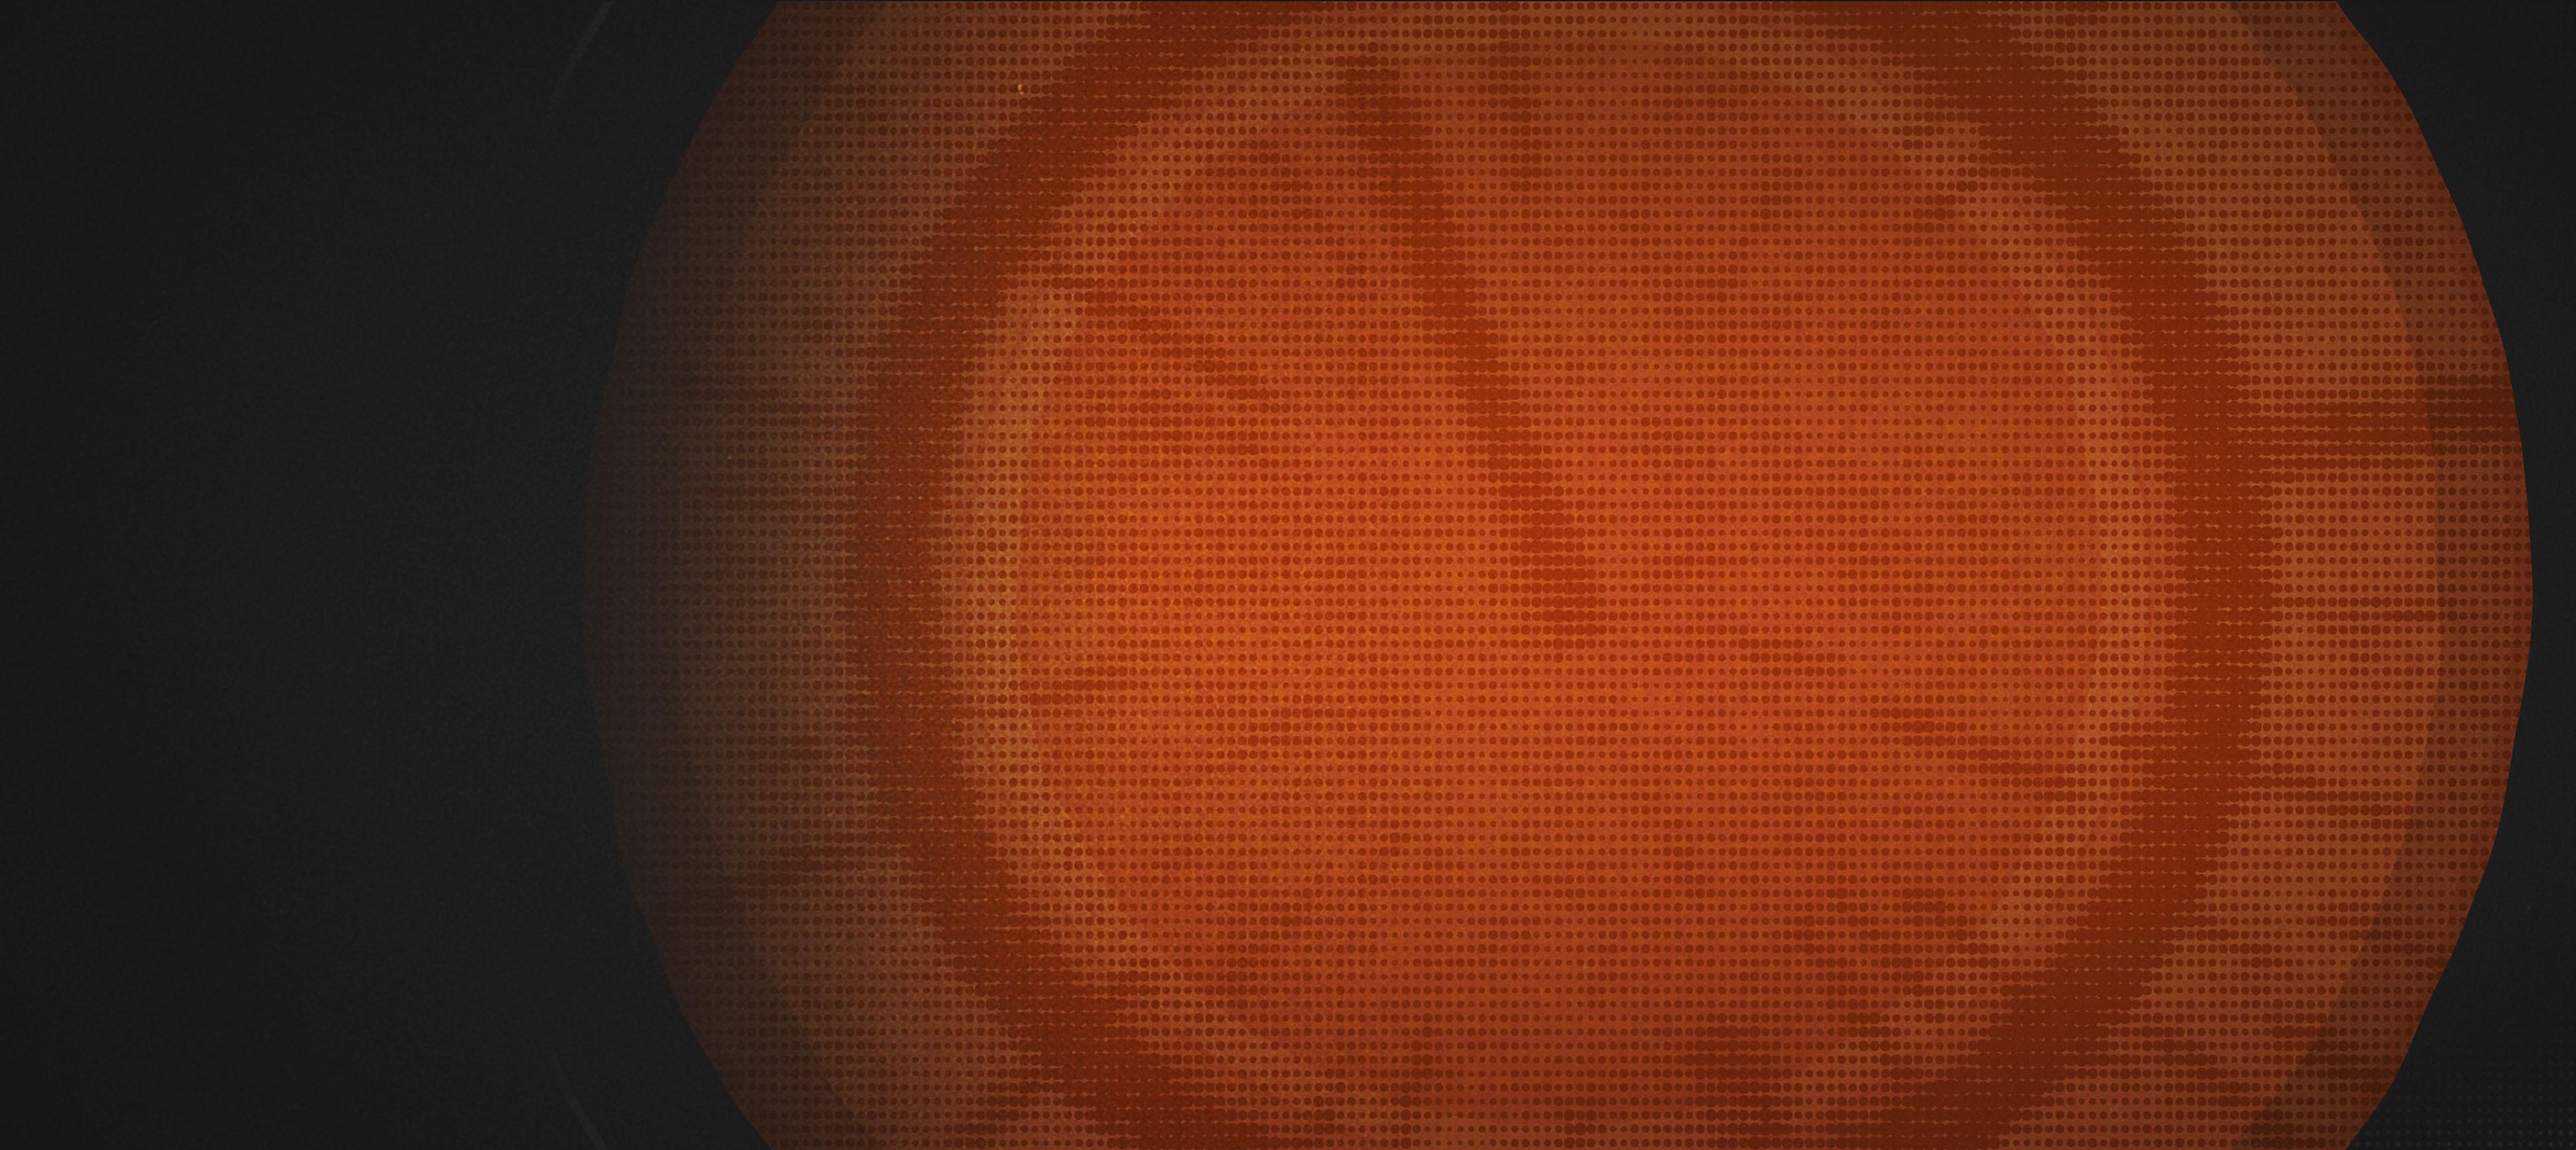 DEATHLOOP textured background